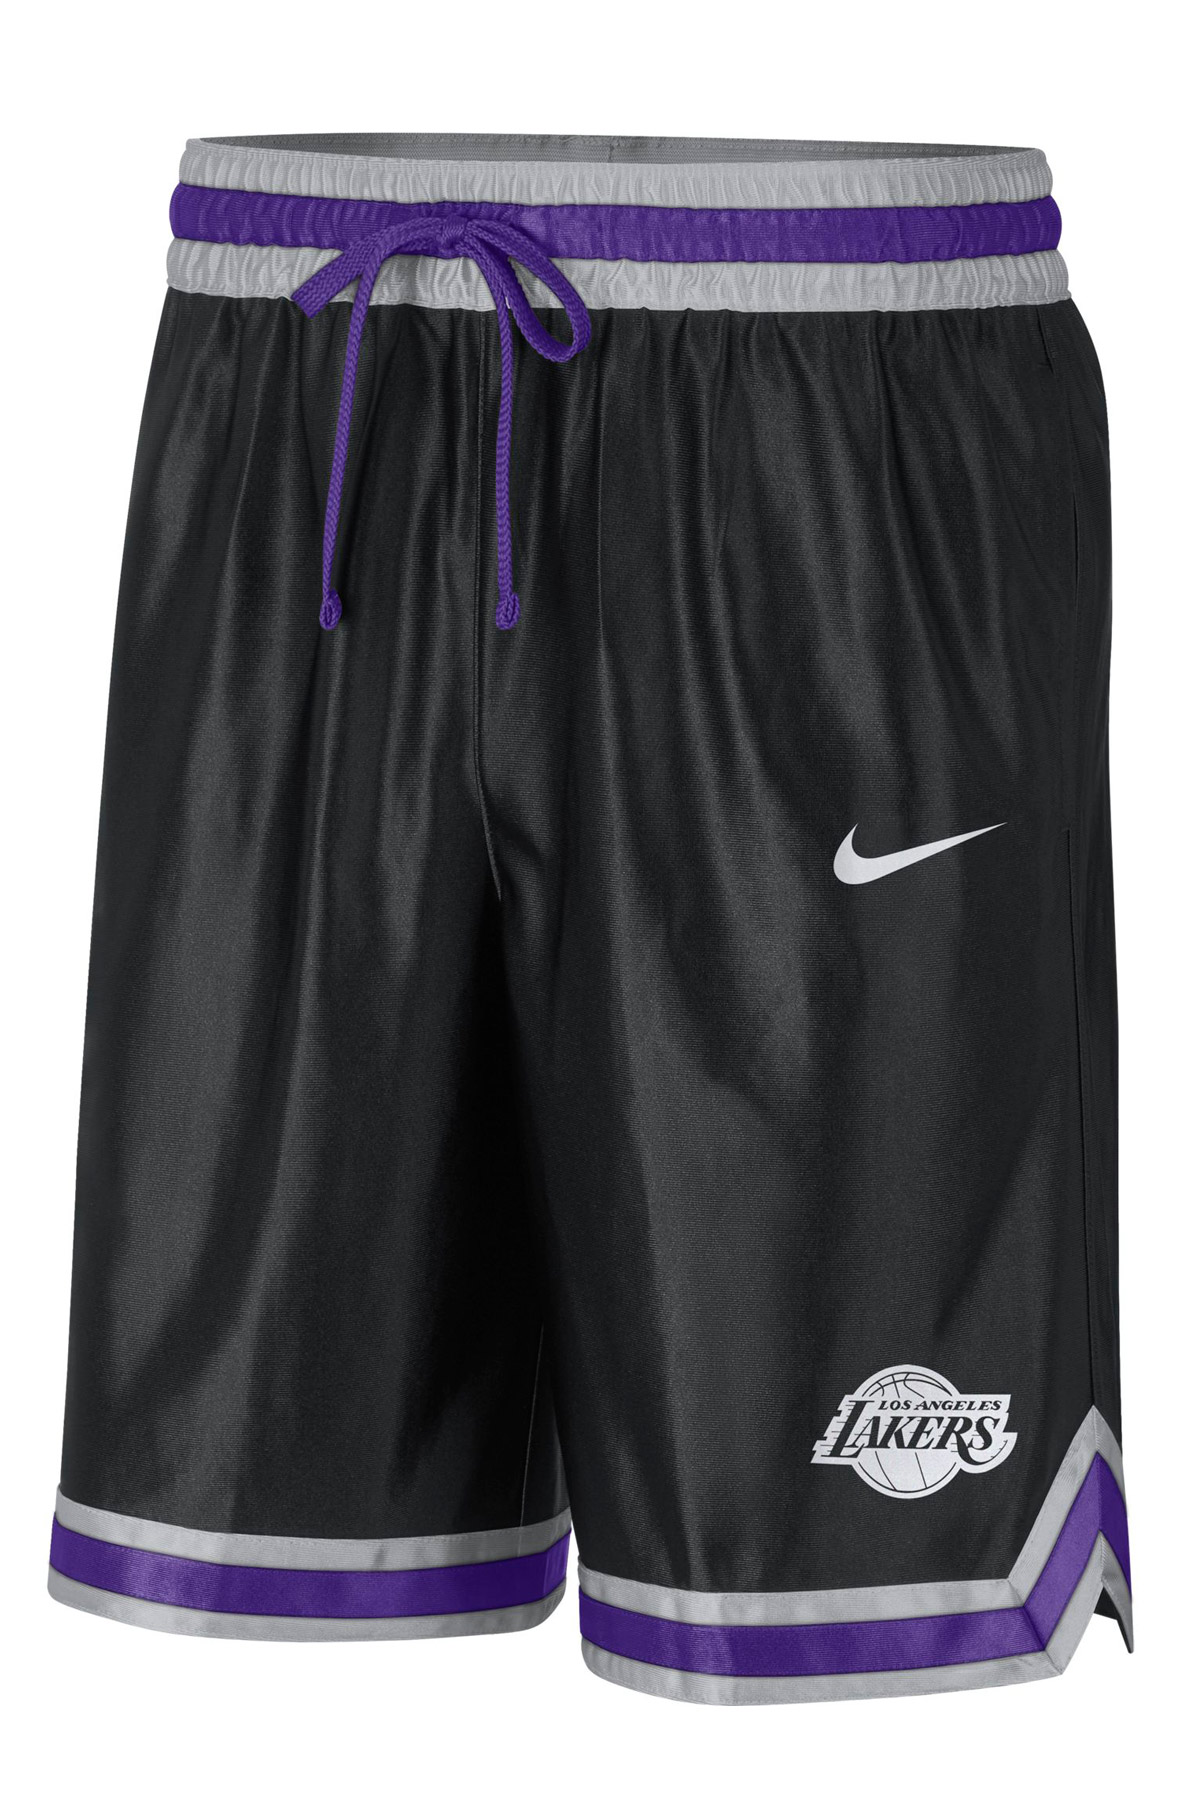 Los Angeles Lakers Courtside NBA Shorts Black/Grey Fog/Field Purple/Amarillo